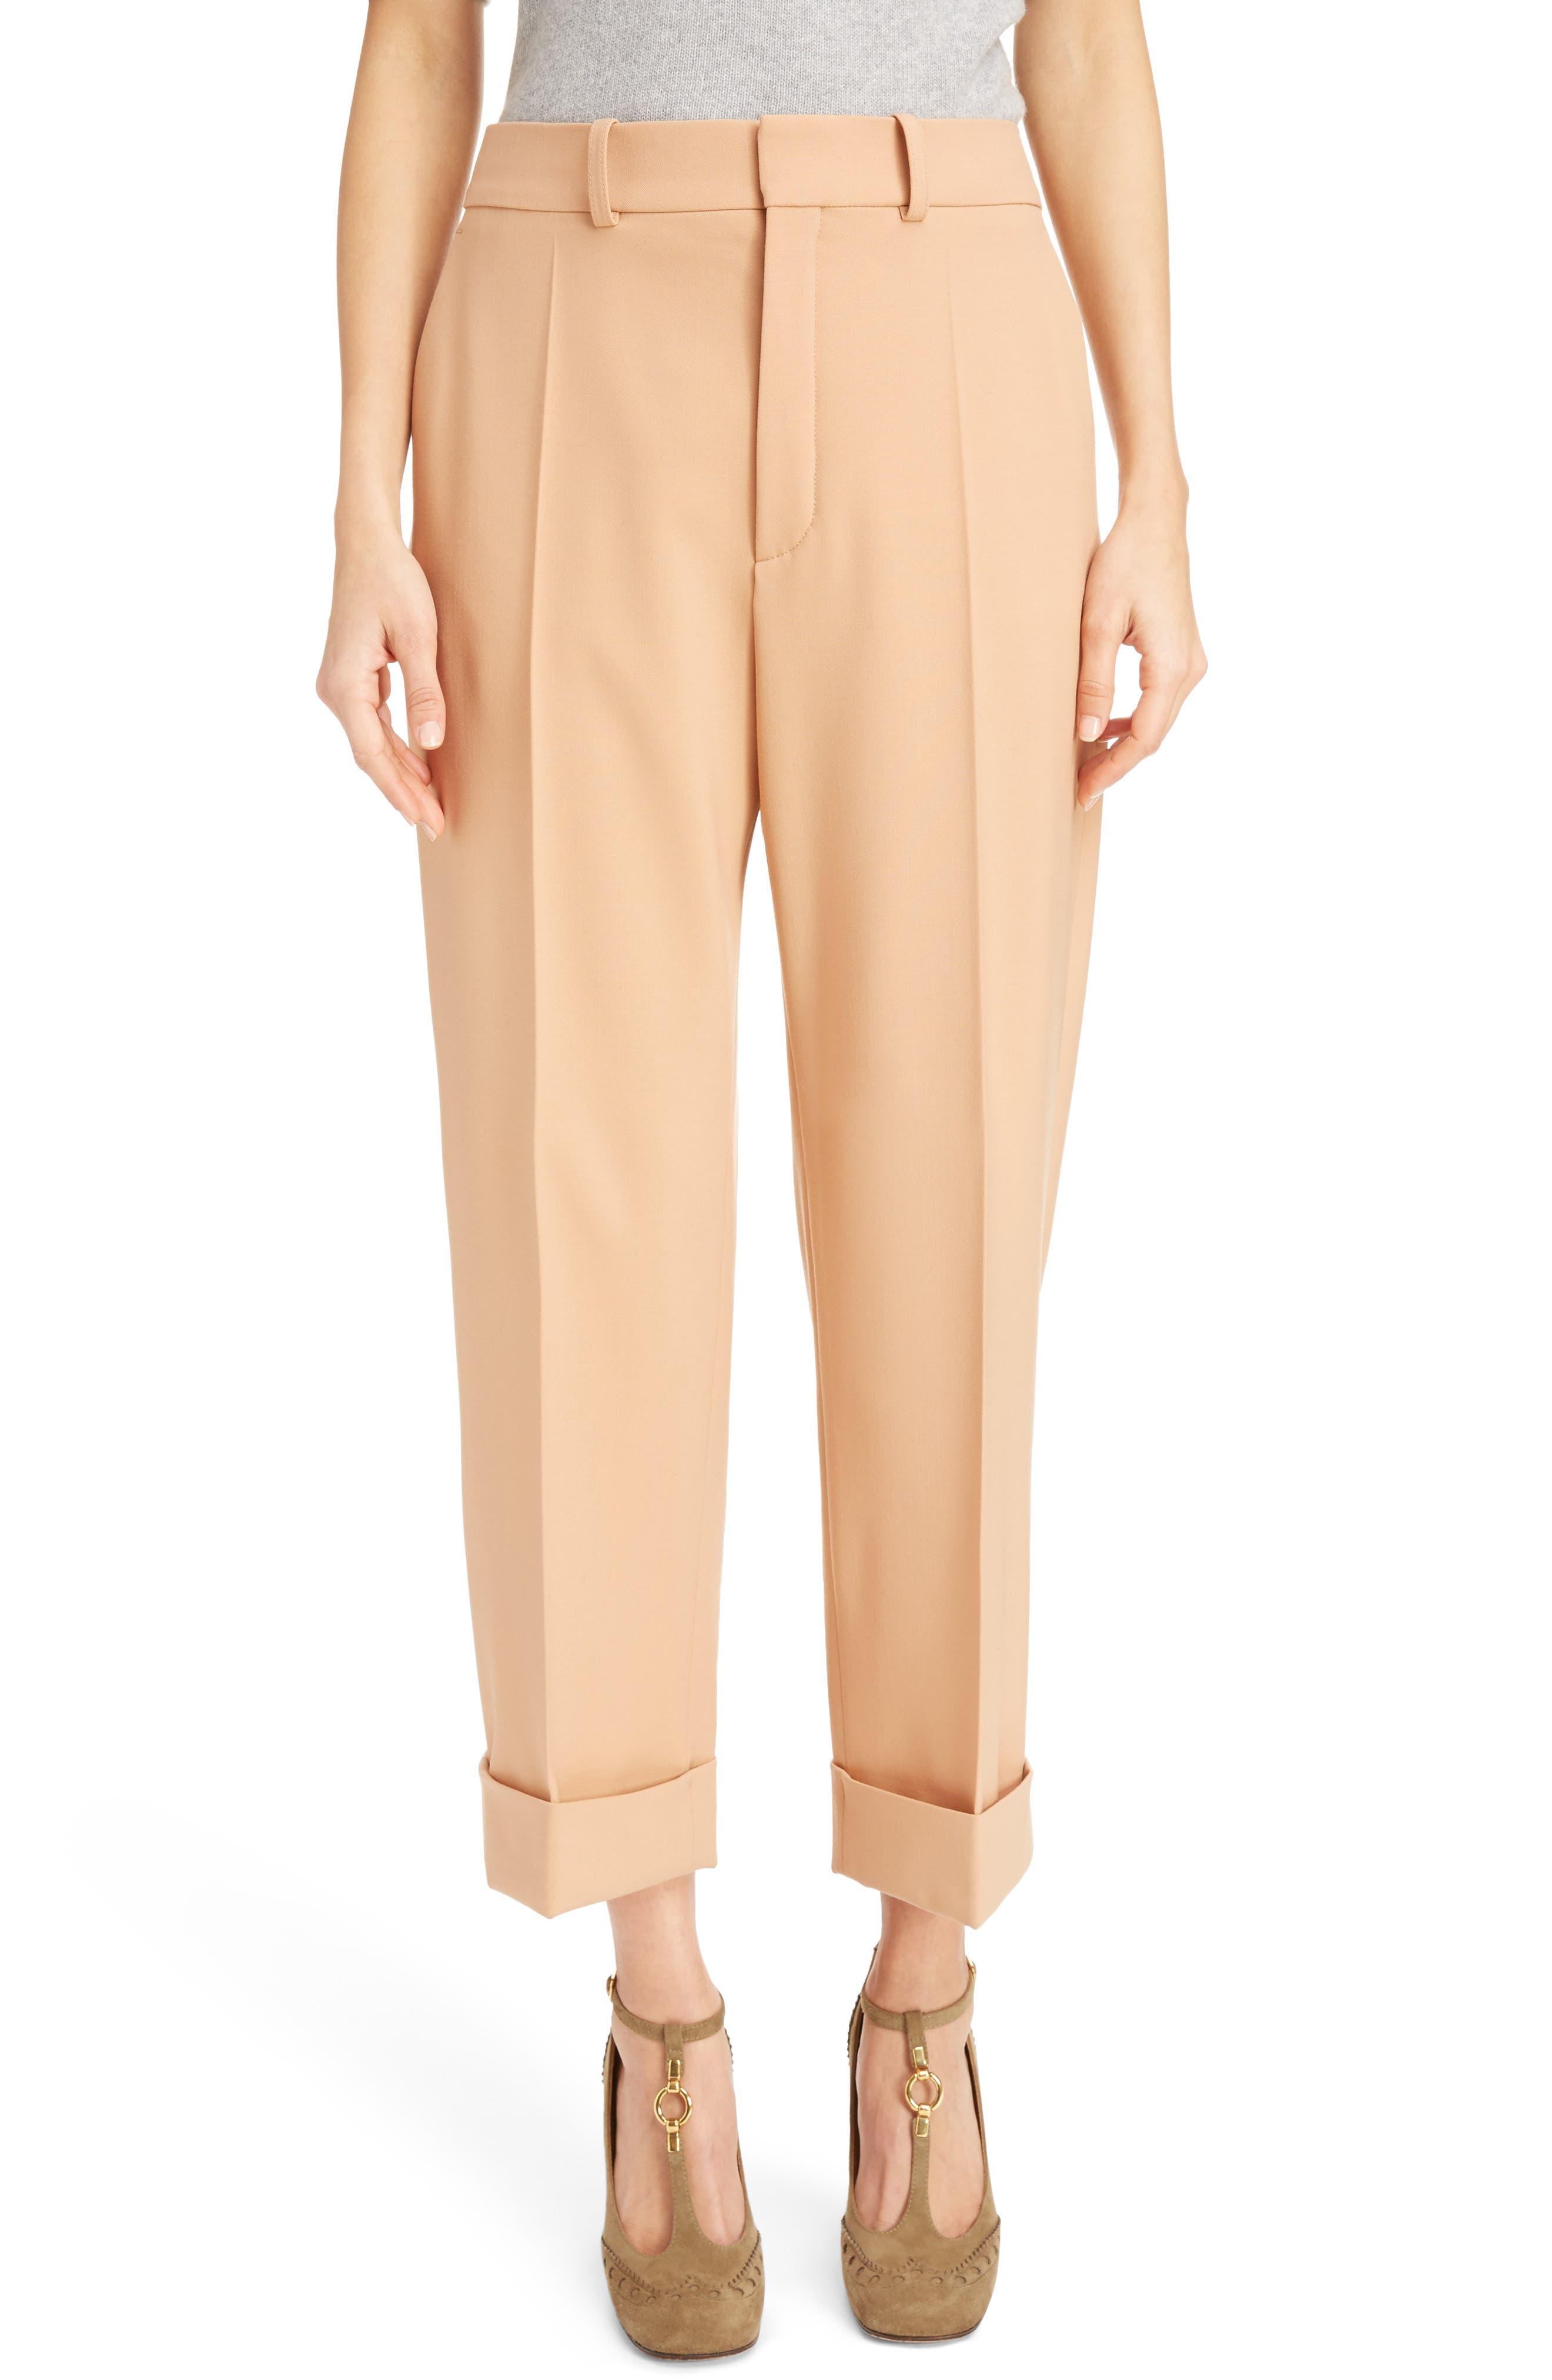 Chloé Cuffed Stretch Wool Pants